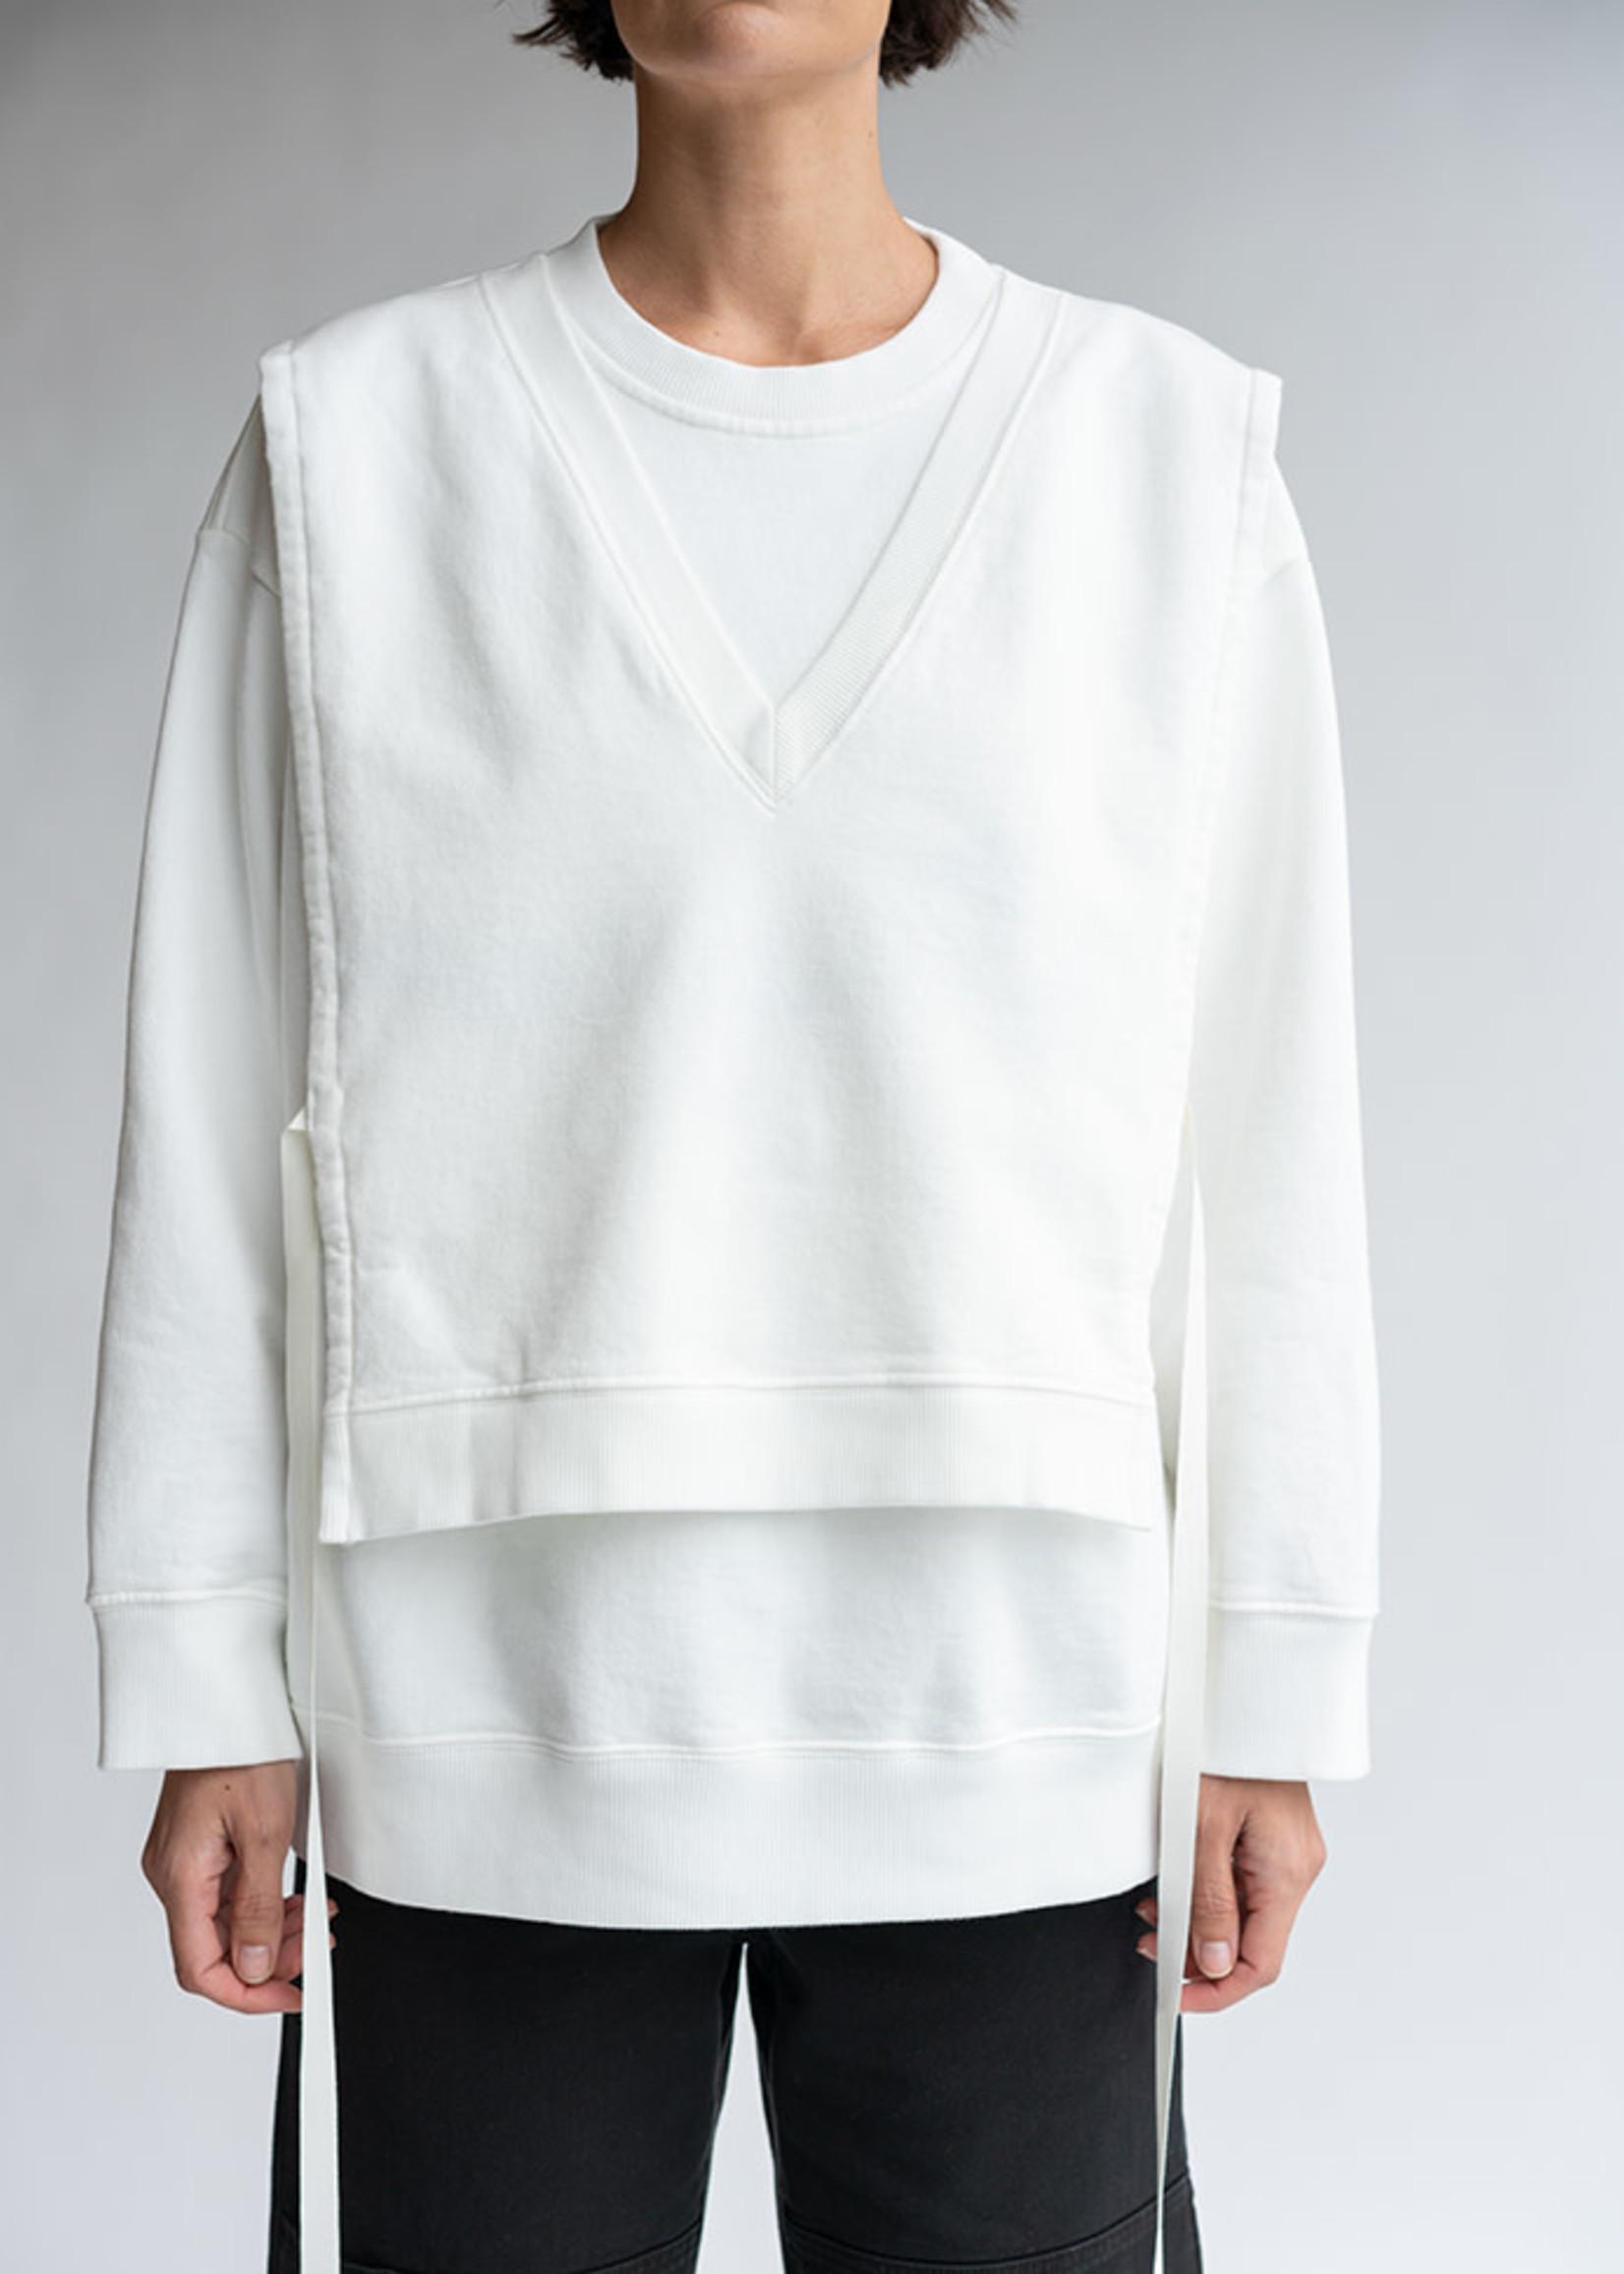 MM6 MAISON MARGIELA V-Neck Bib Logo Sweatshirt